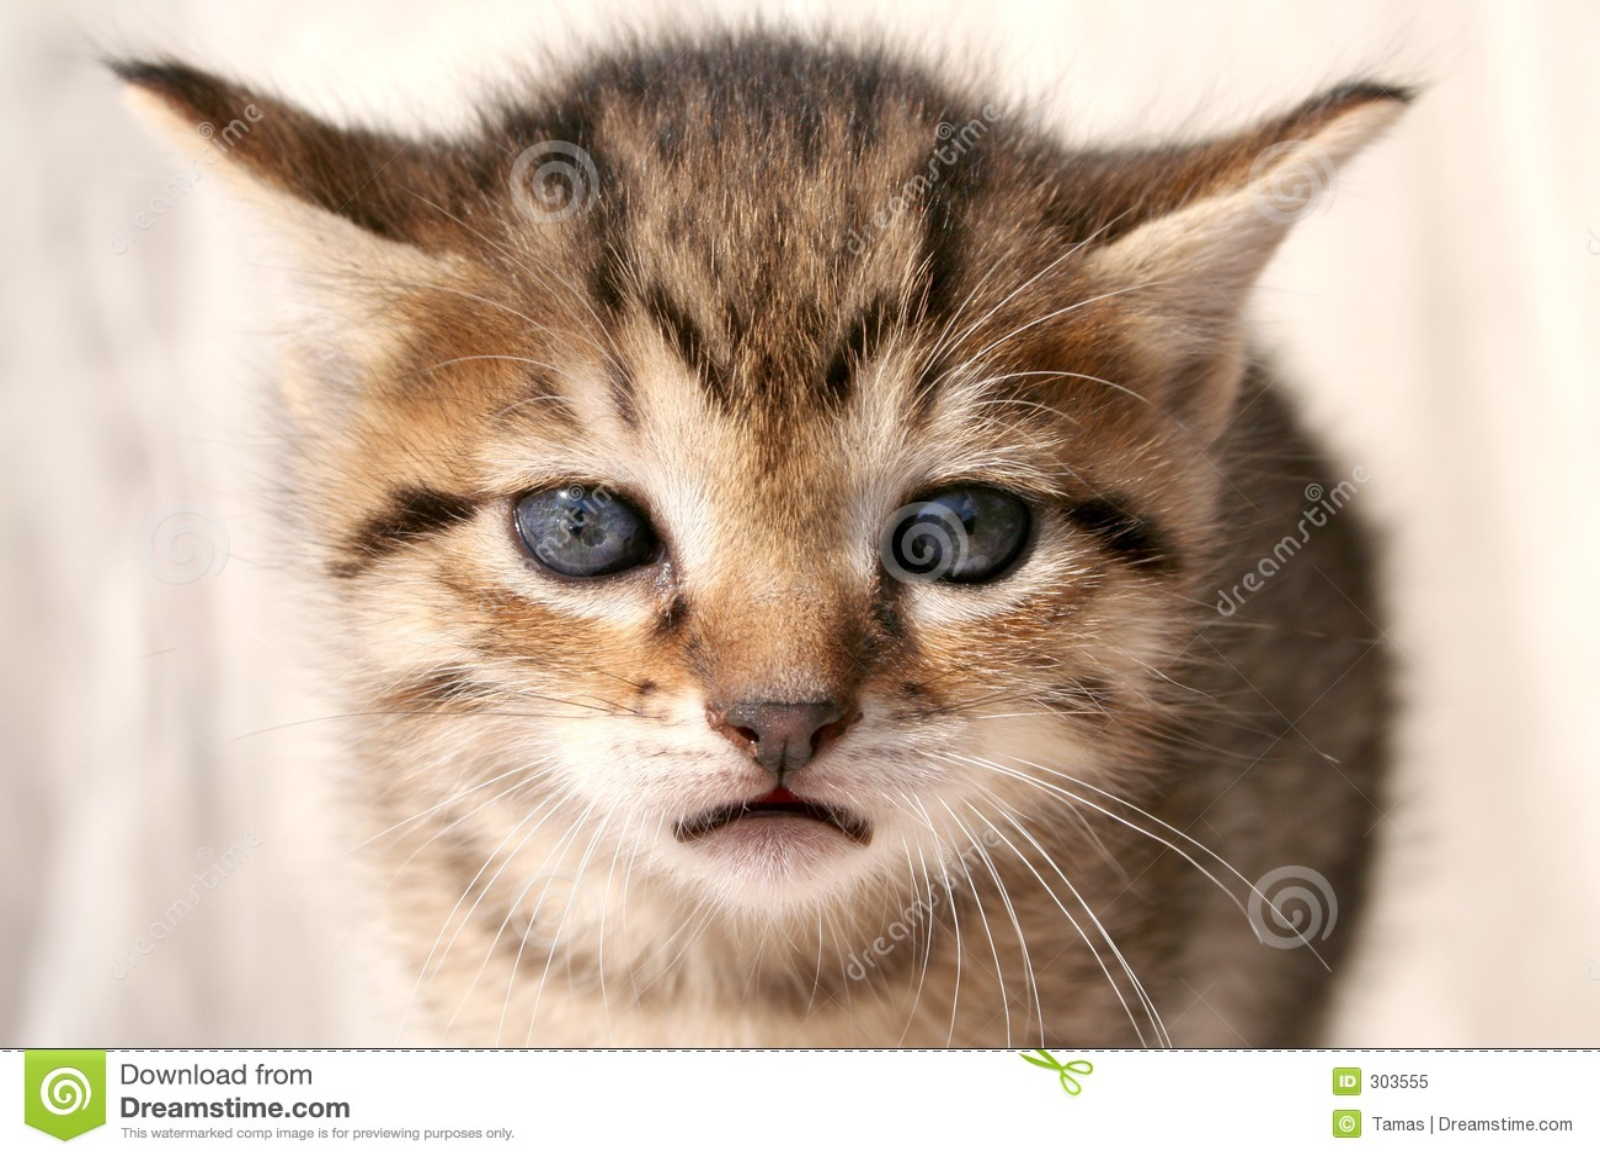 Very Sad Cat Pictures